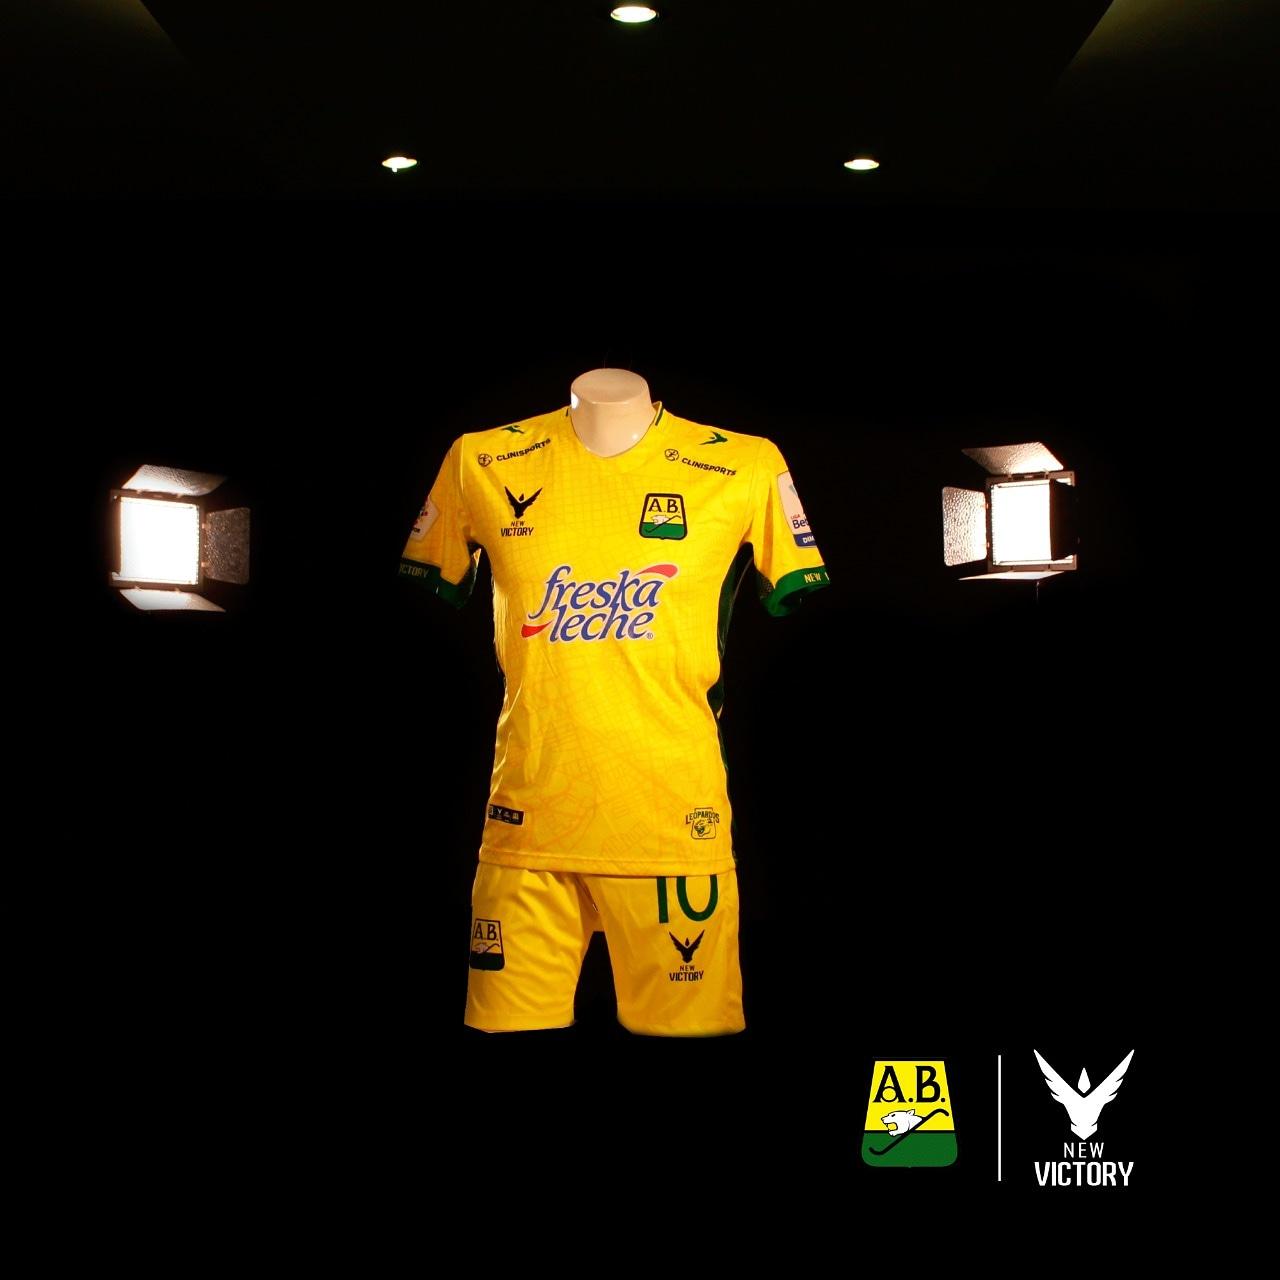 Camisas do Atlético Bucaramanga 2021 New Victory